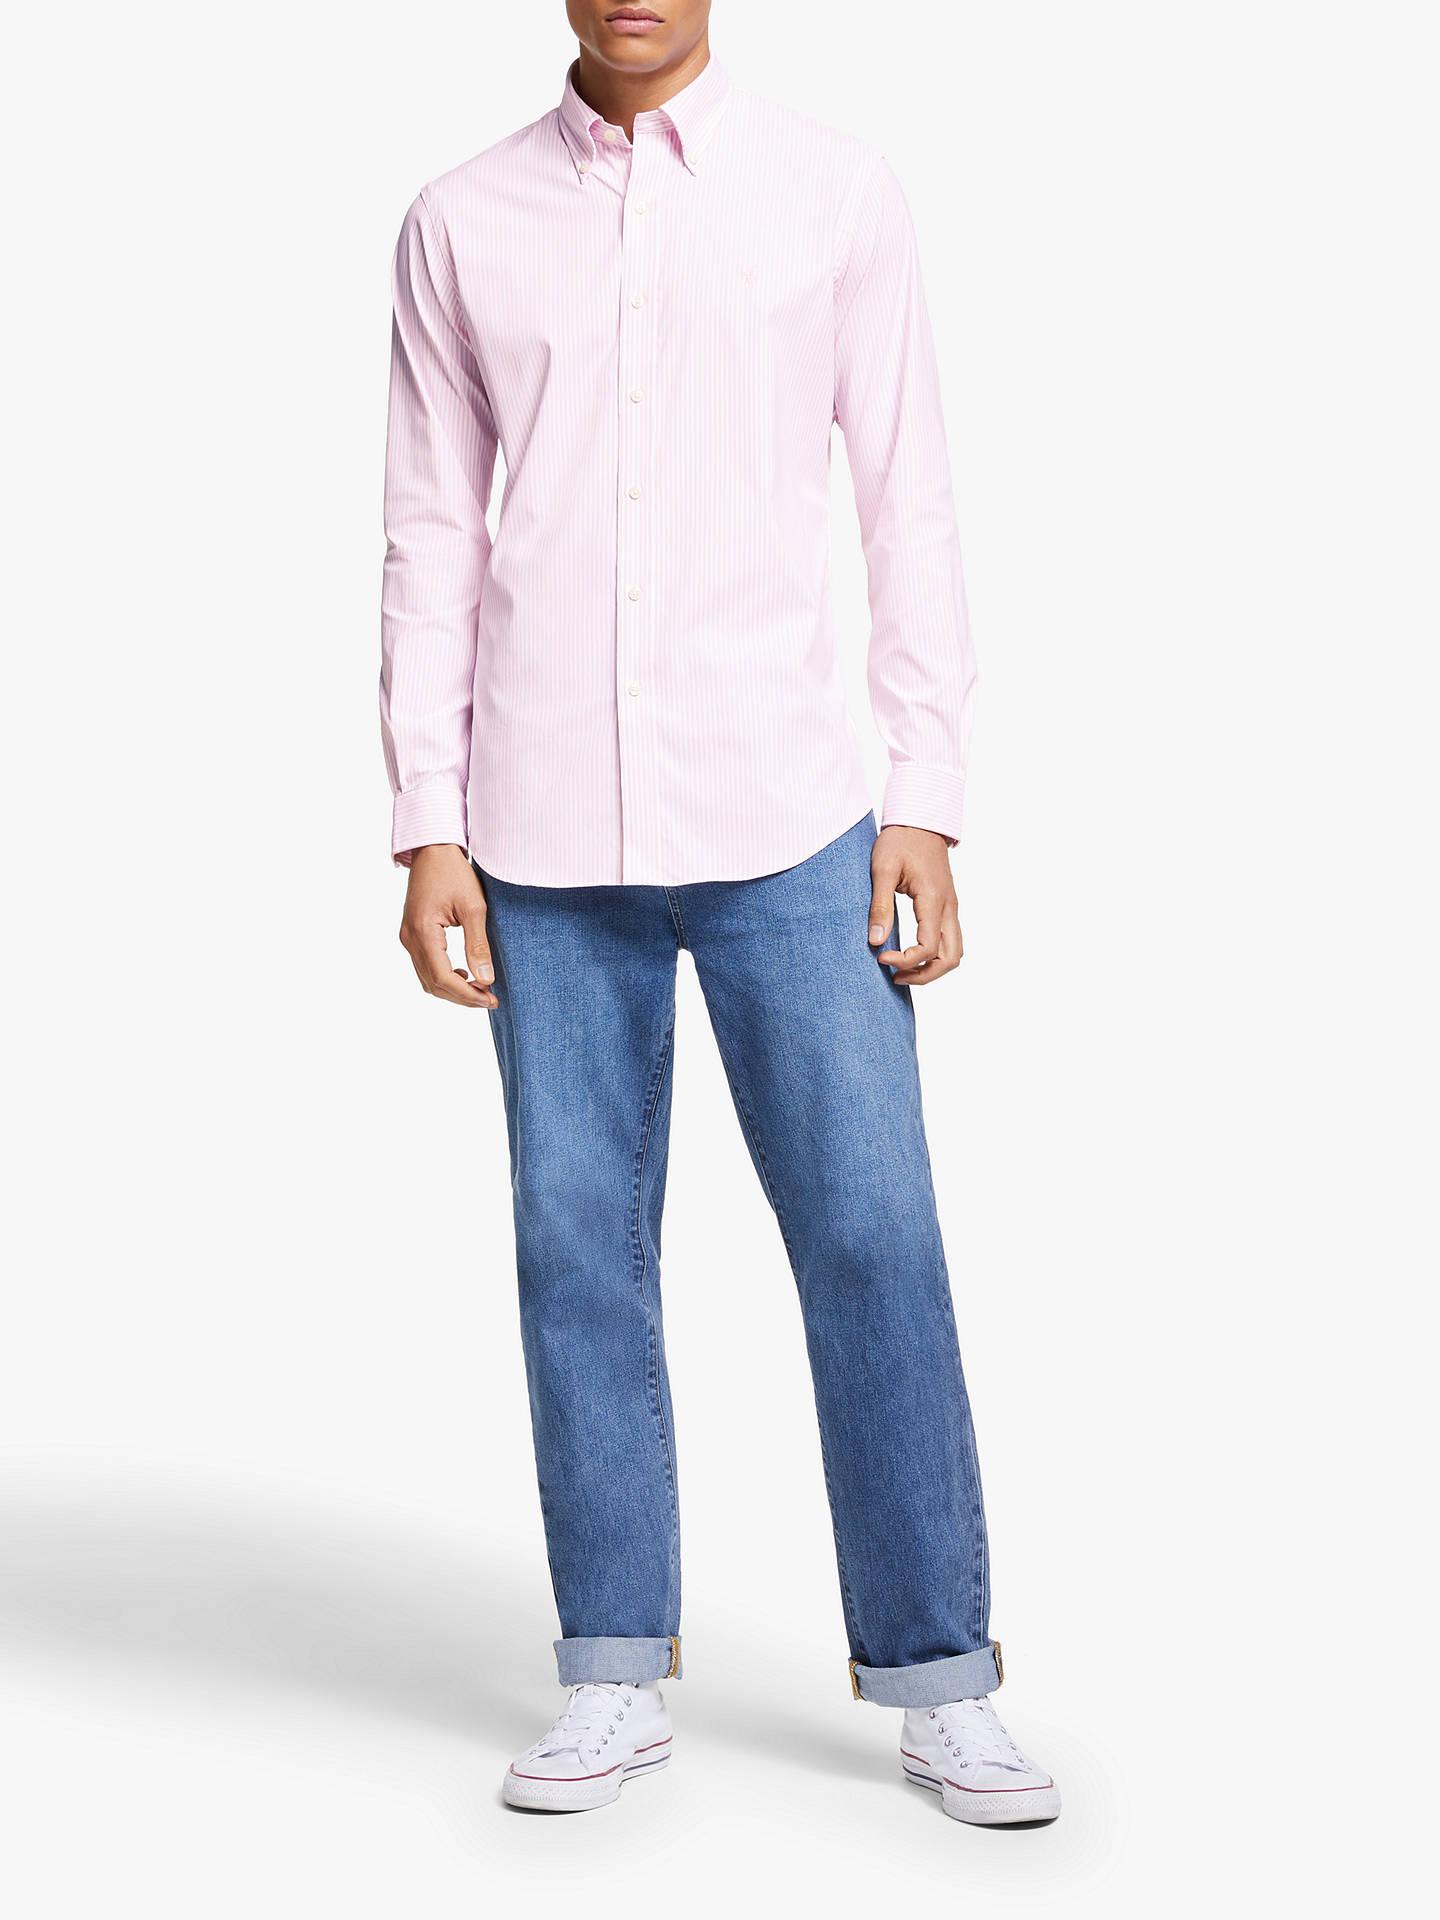 0868184e9c Polo Golf by Ralph Lauren Performance Oxford Stripe Shirt, Pink/White